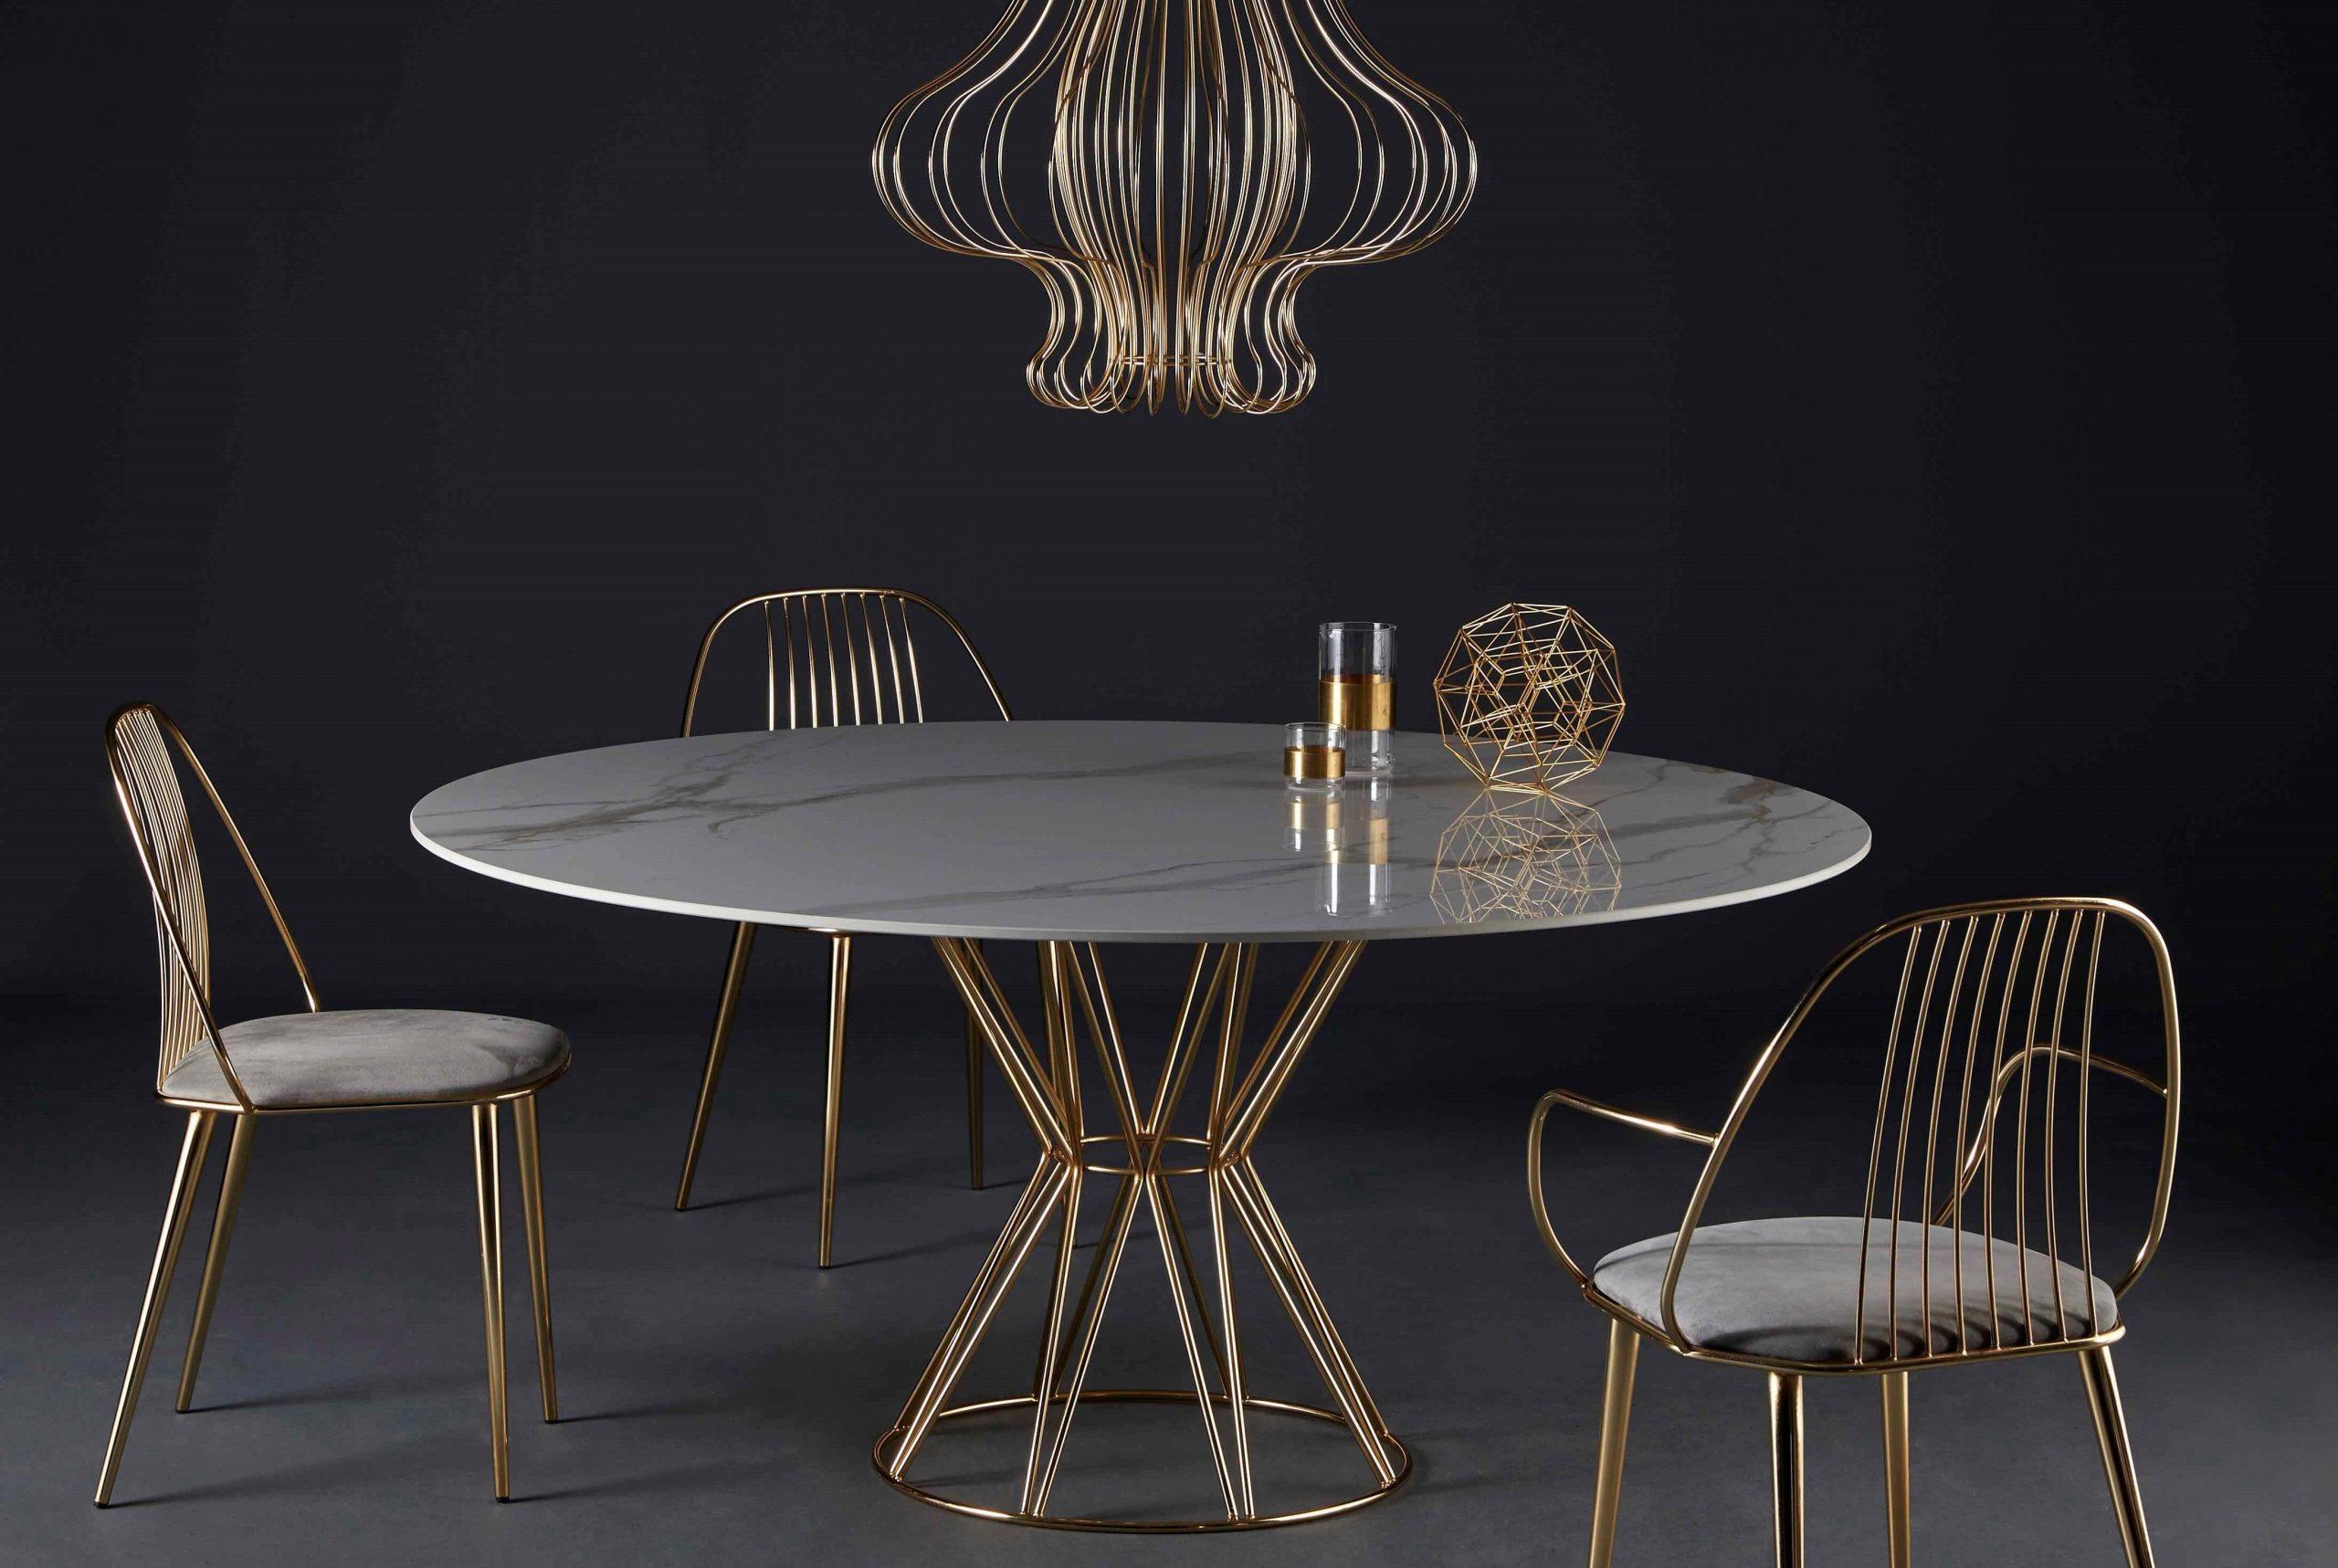 Colico Circus Table